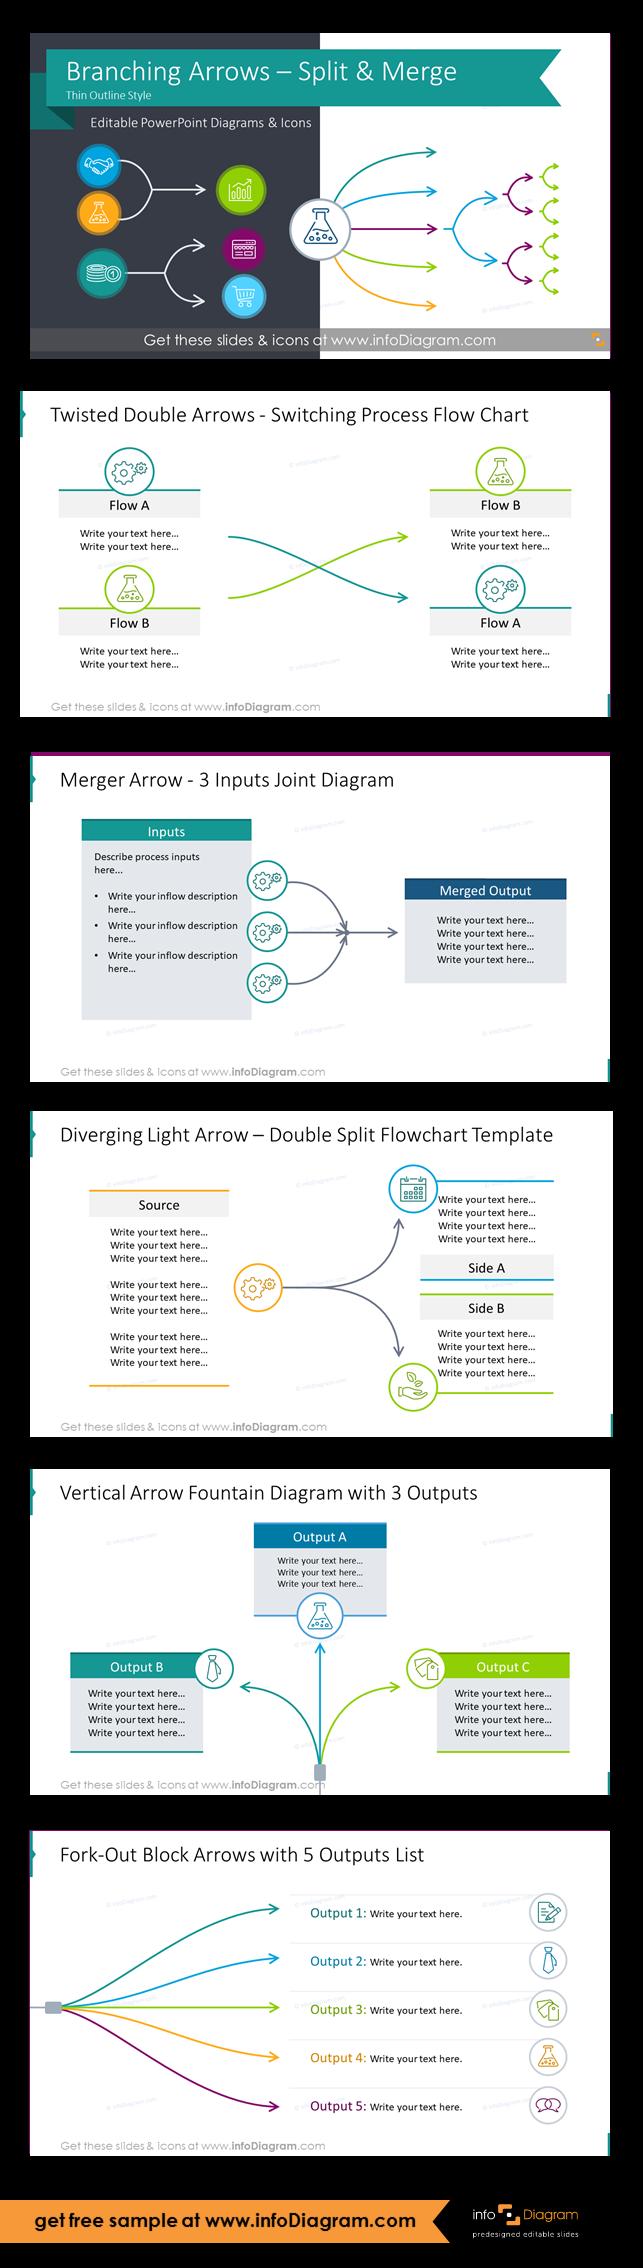 Thin Block Arrows Of Branching Processes Fork Mutliple Split Or Merge Powerpoint Flow Charts Outline Process Flow Process Flow Chart Flow Chart Template